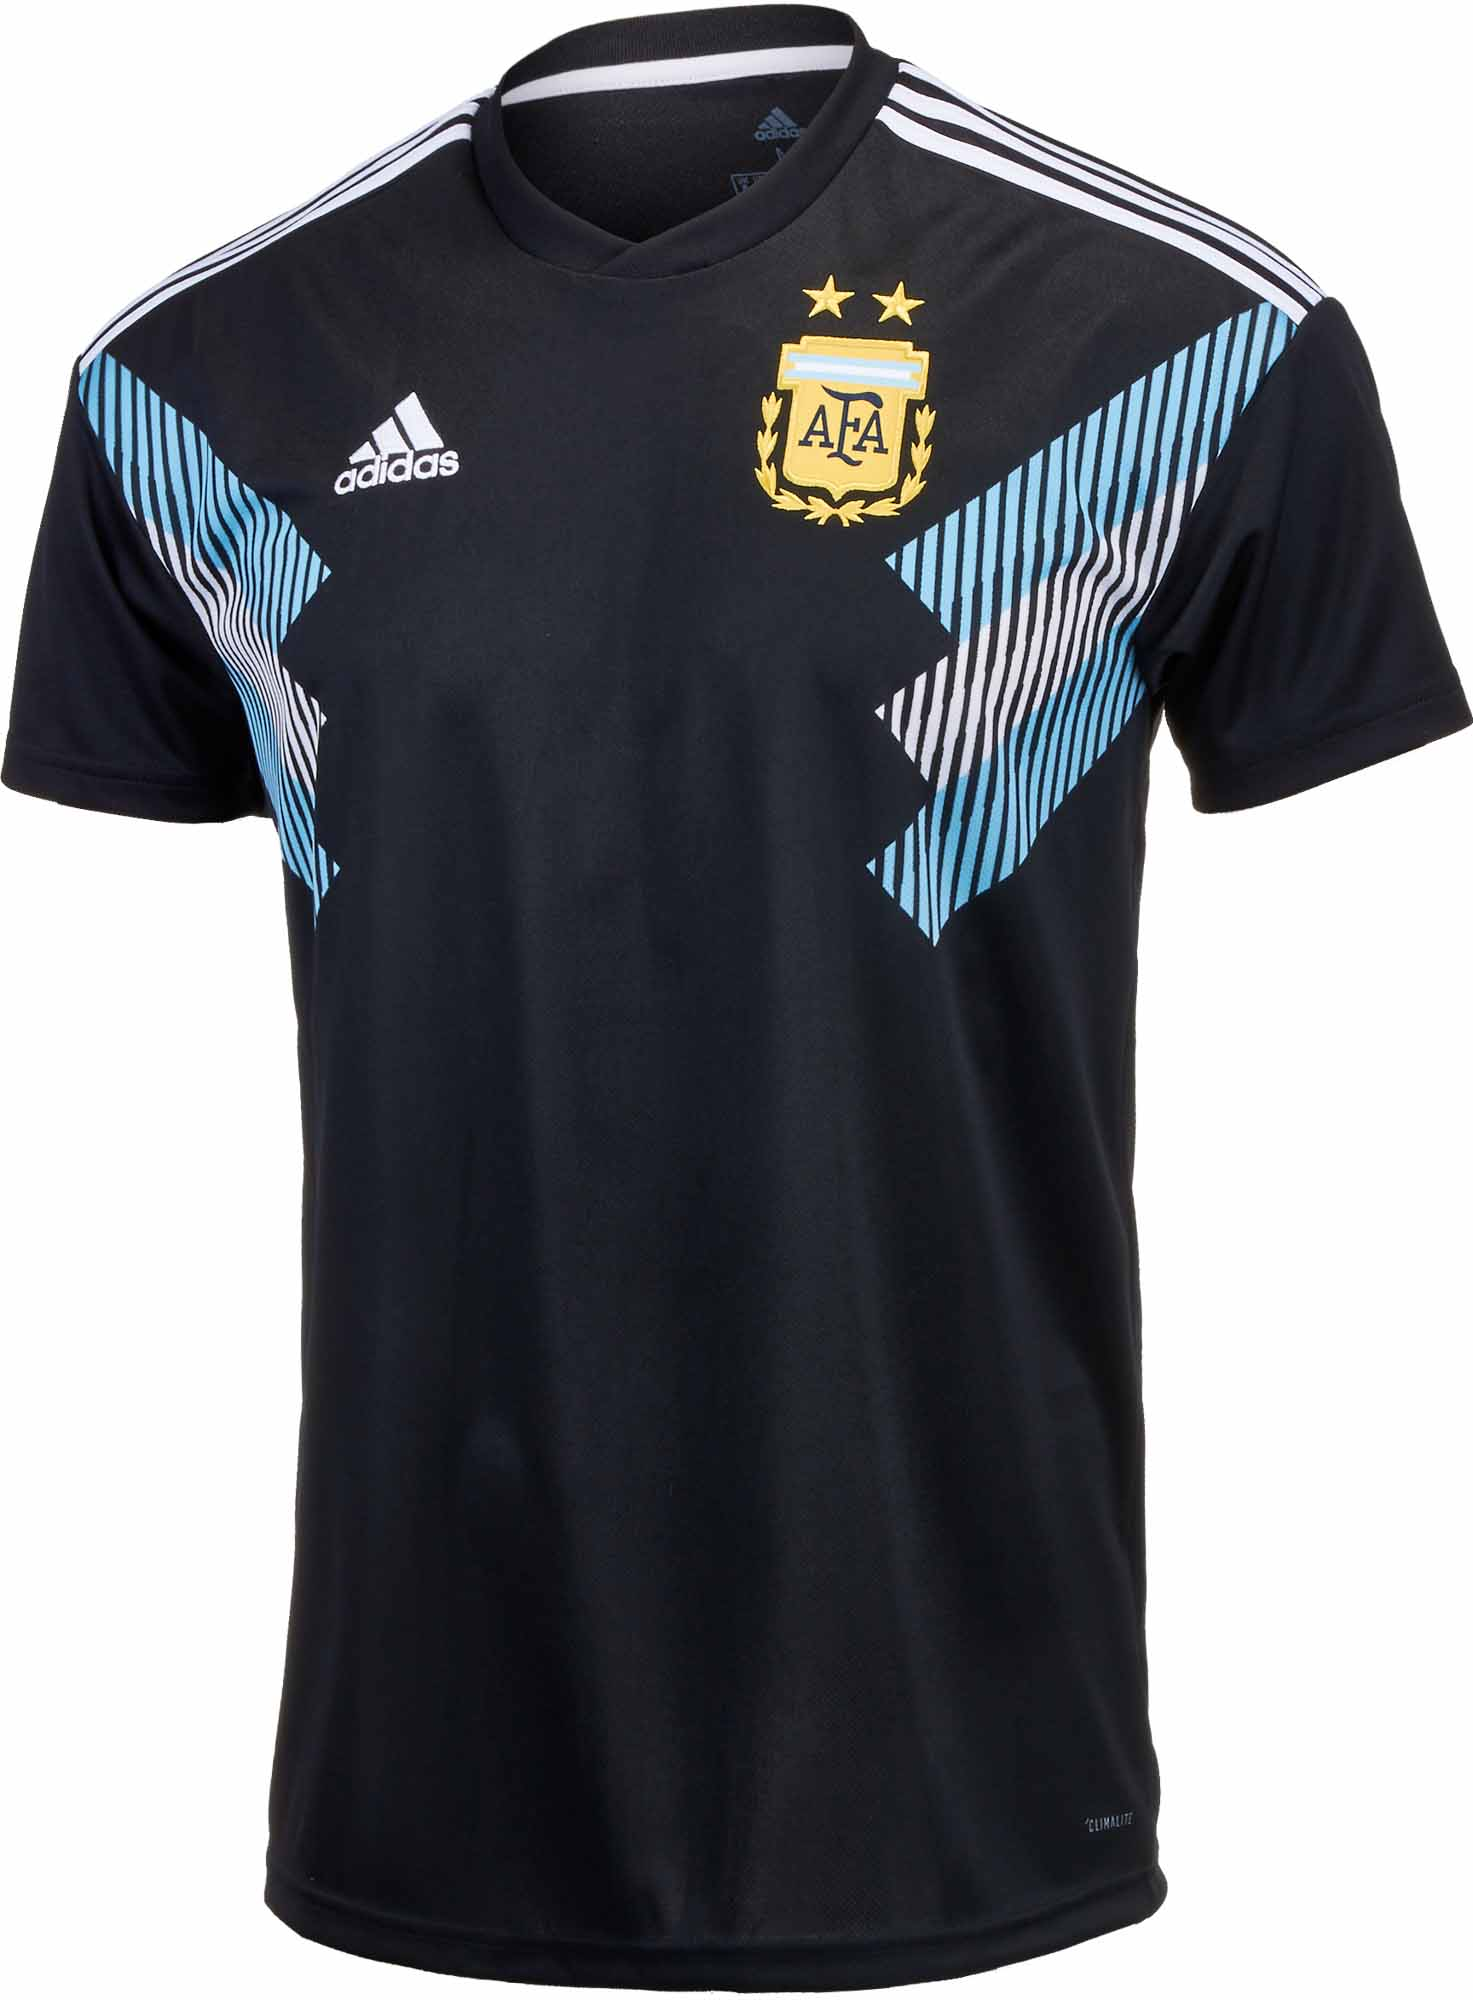 73bfeb09b5d adidas Kids Argentina Away Jersey 2018-19 - SoccerPro.com